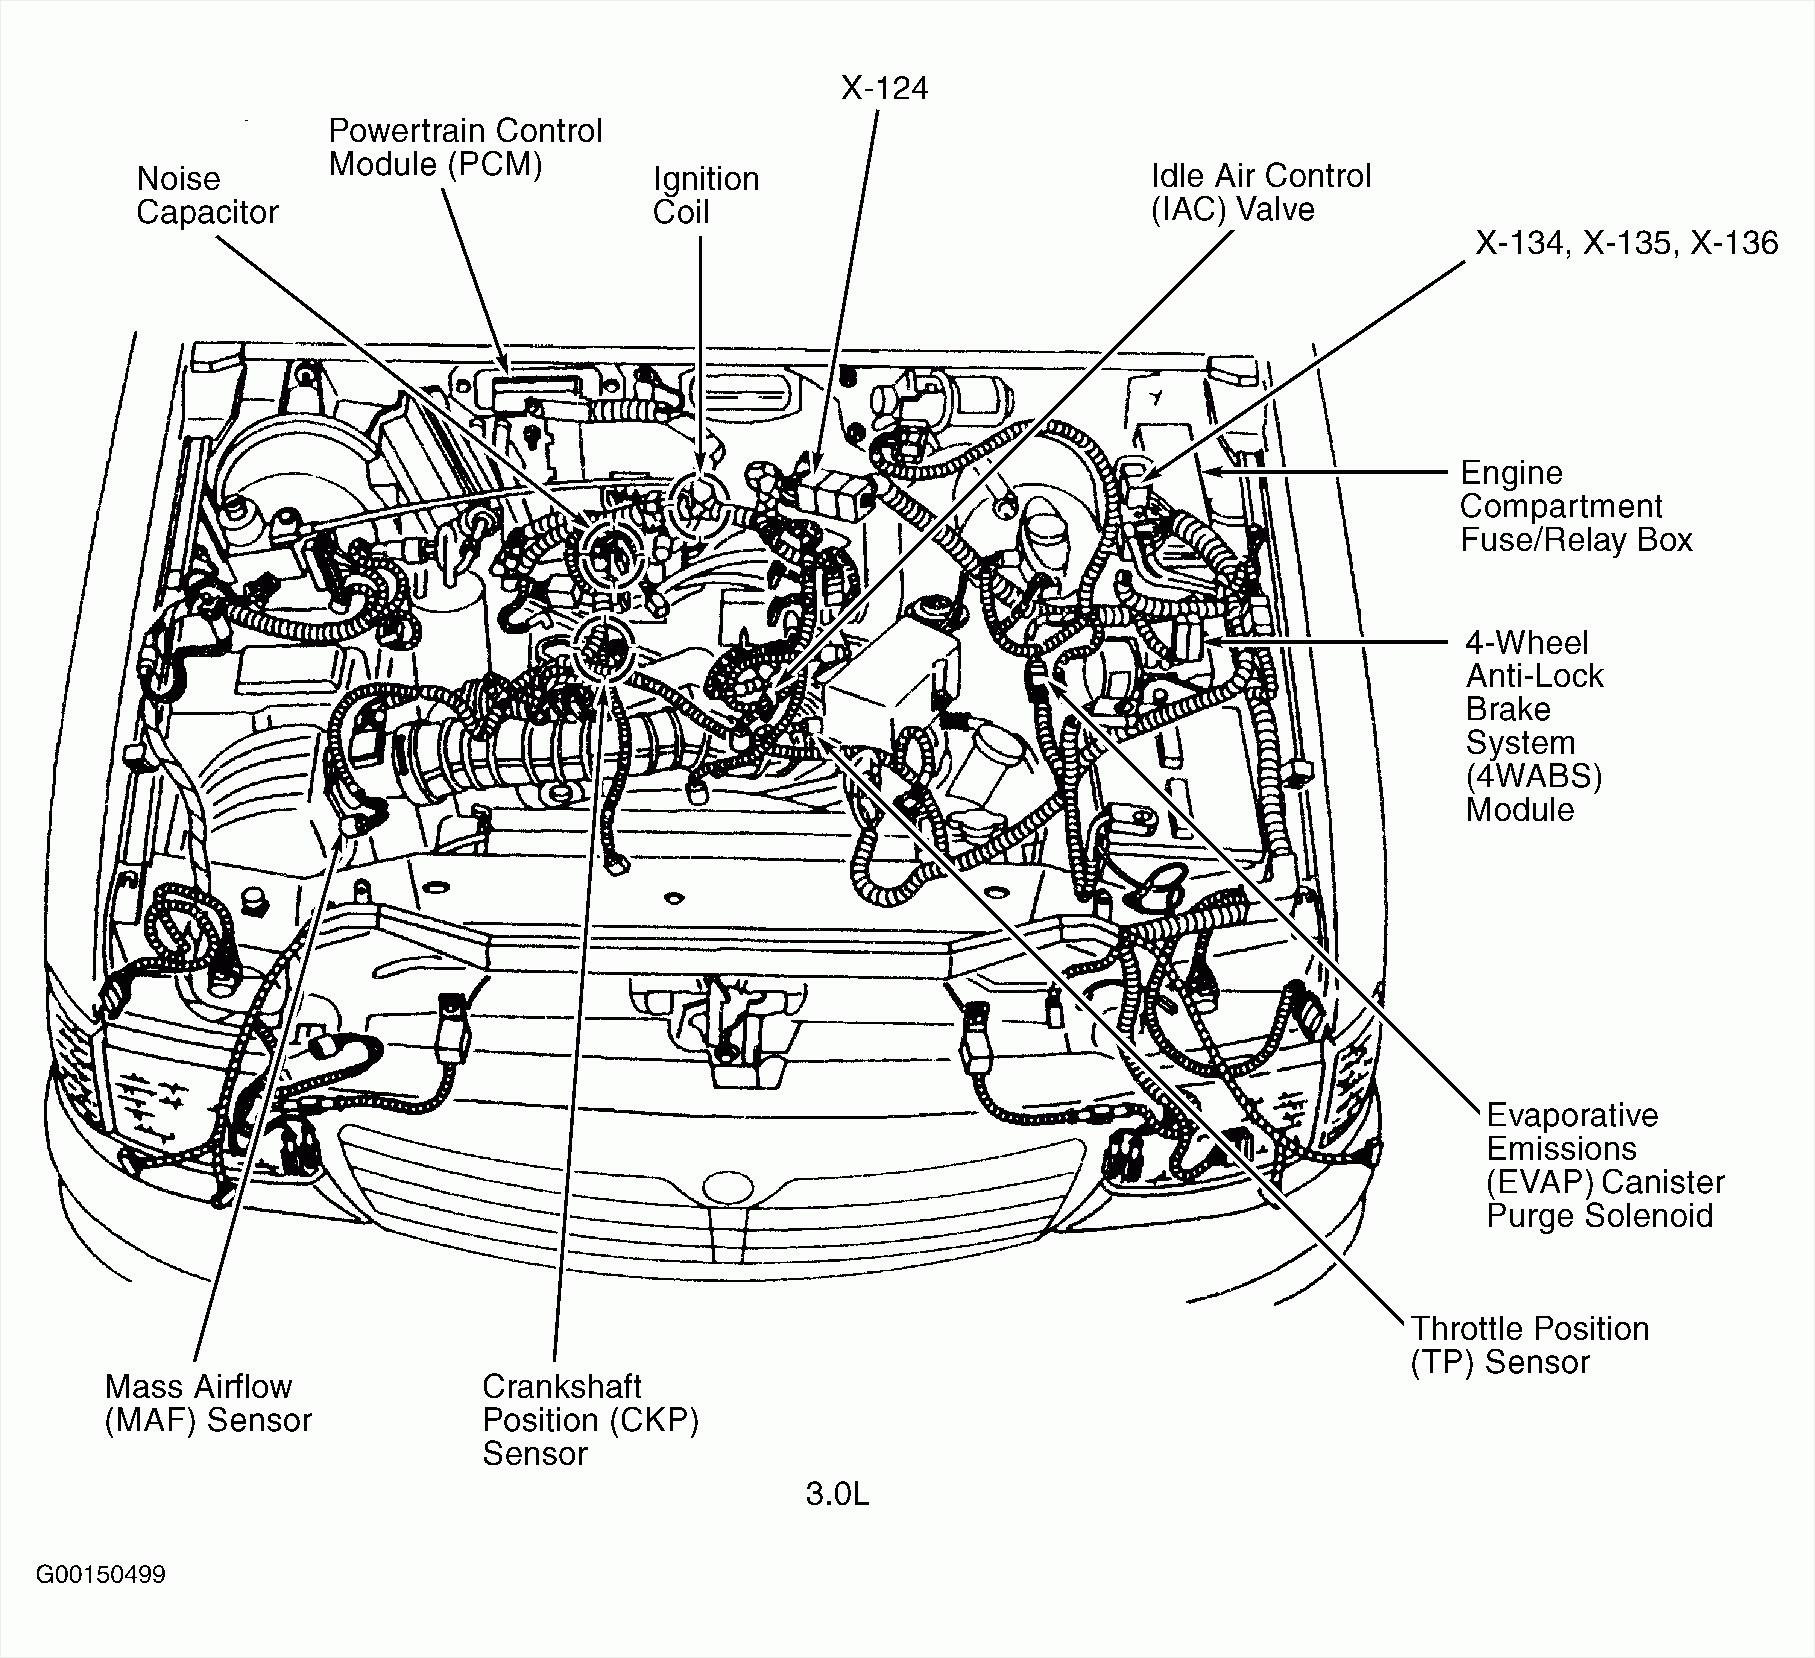 2006 Vw Passat Engine Diagram 2008 Jetta Wiring Diagram Wiring Diagram Datasource